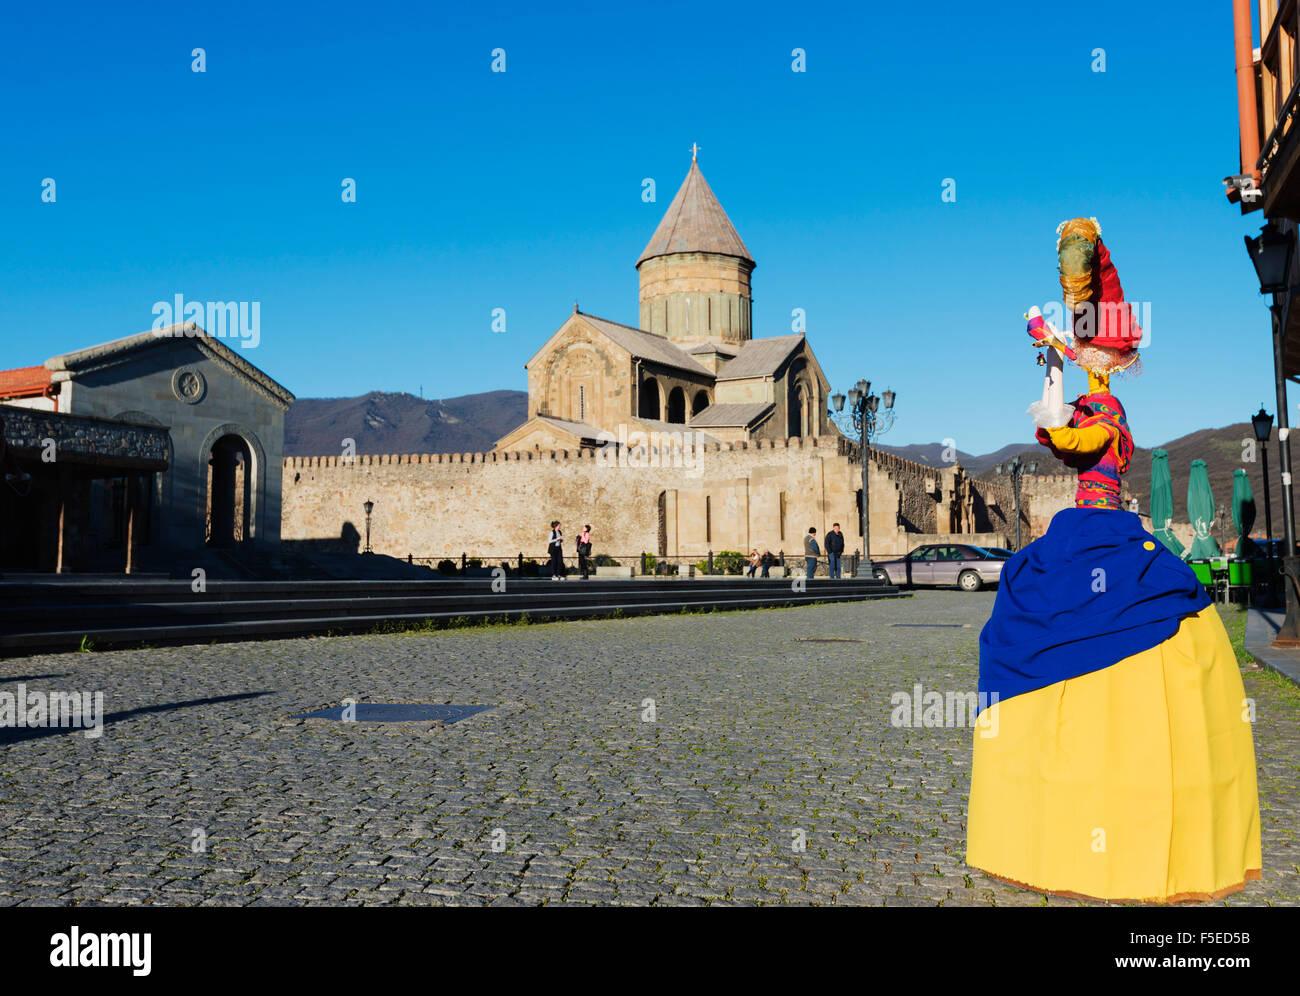 Local artisan doll display, Svetitskhoveli Cathedral, 11th century, by Patriach Melkisedek, Mtskheta, Georgia, Caucasus, - Stock Image